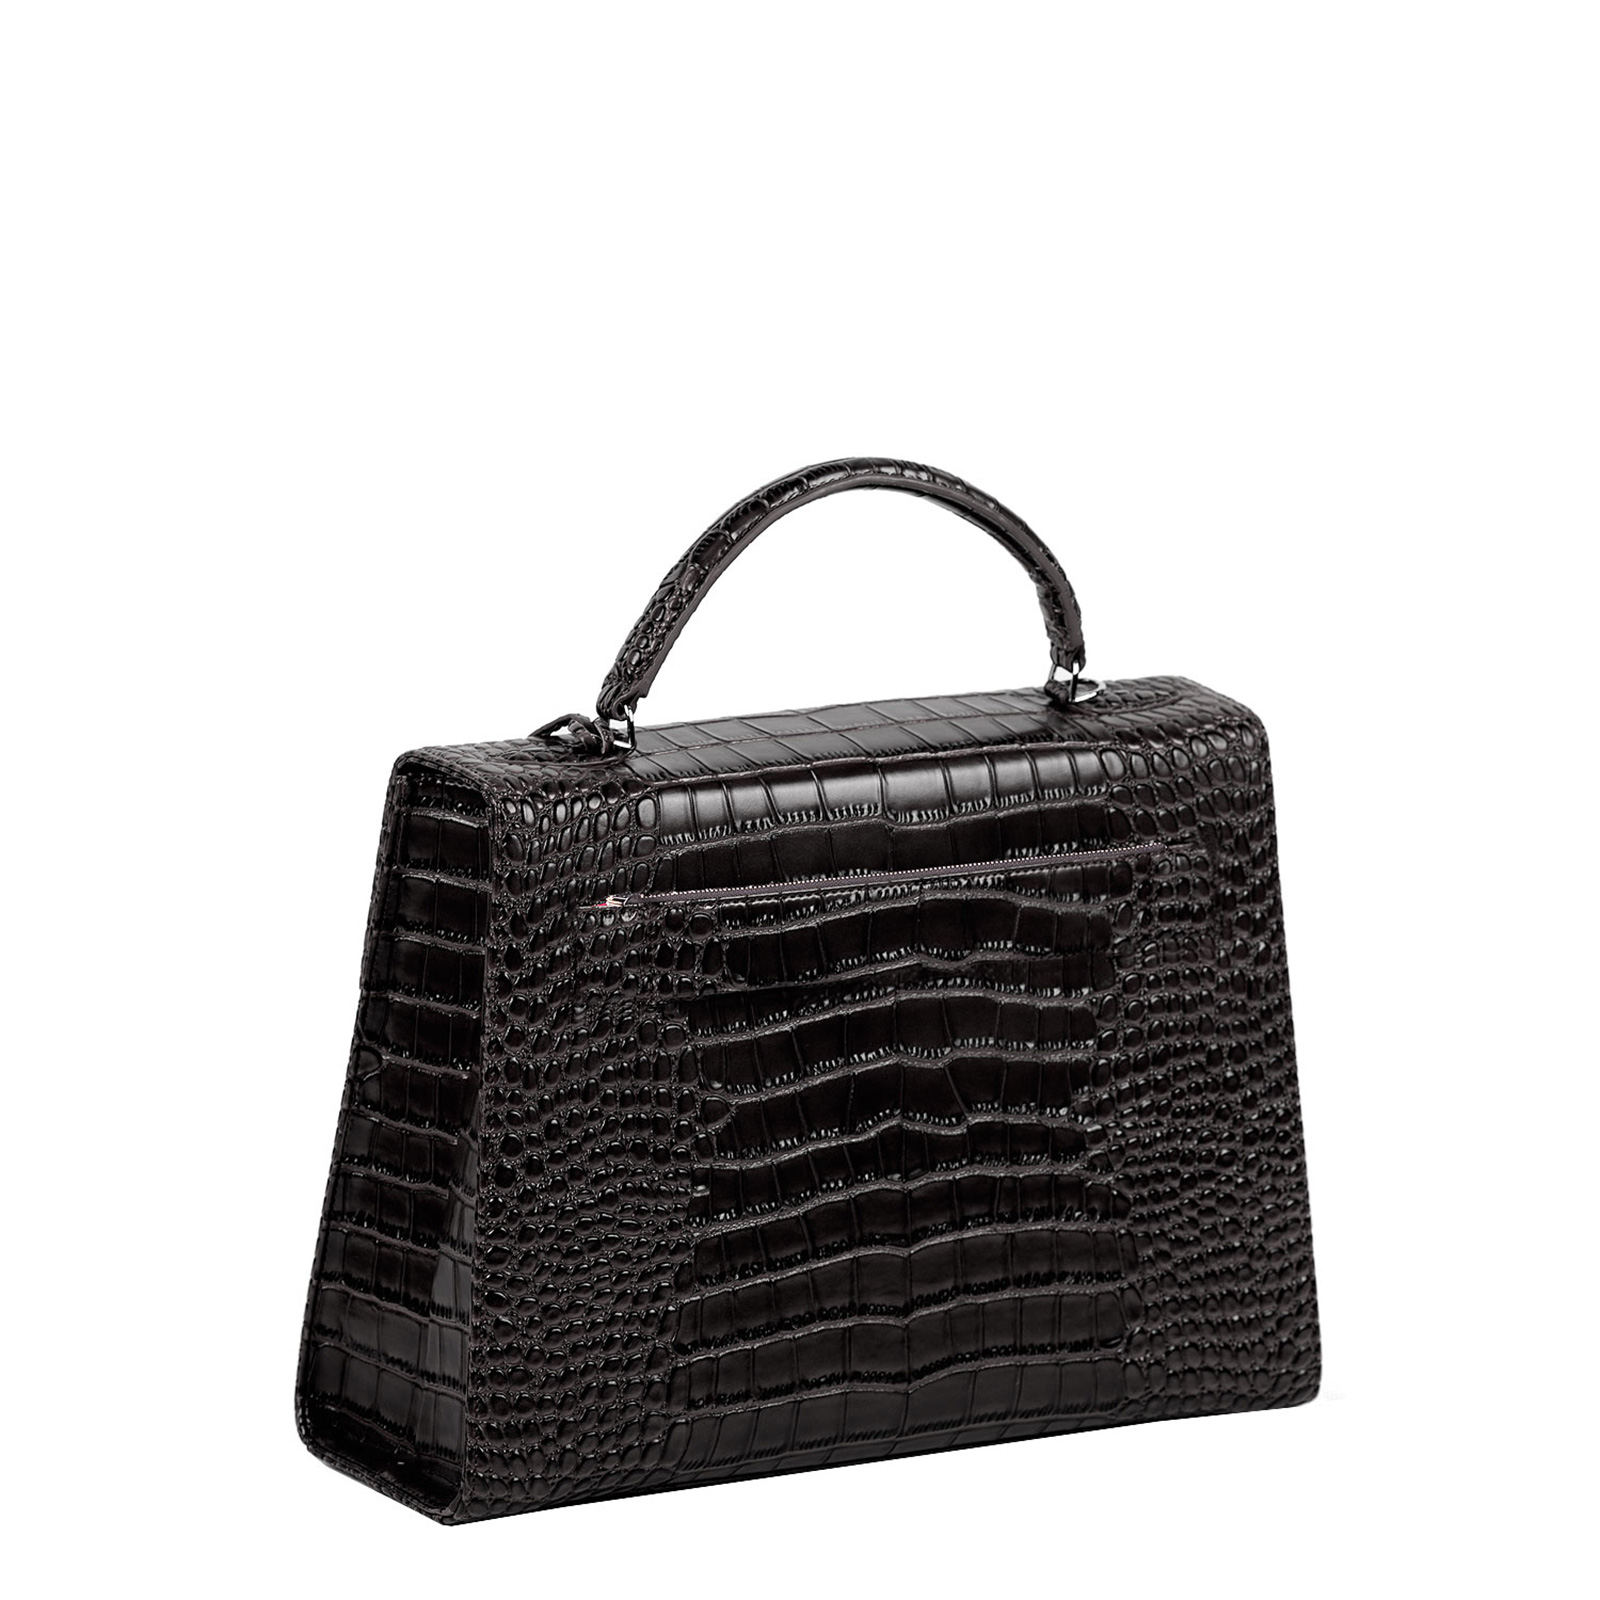 32c42cbce1e9b SOCHA Business-Handtasche Audrey Croco 40 günstig kaufen